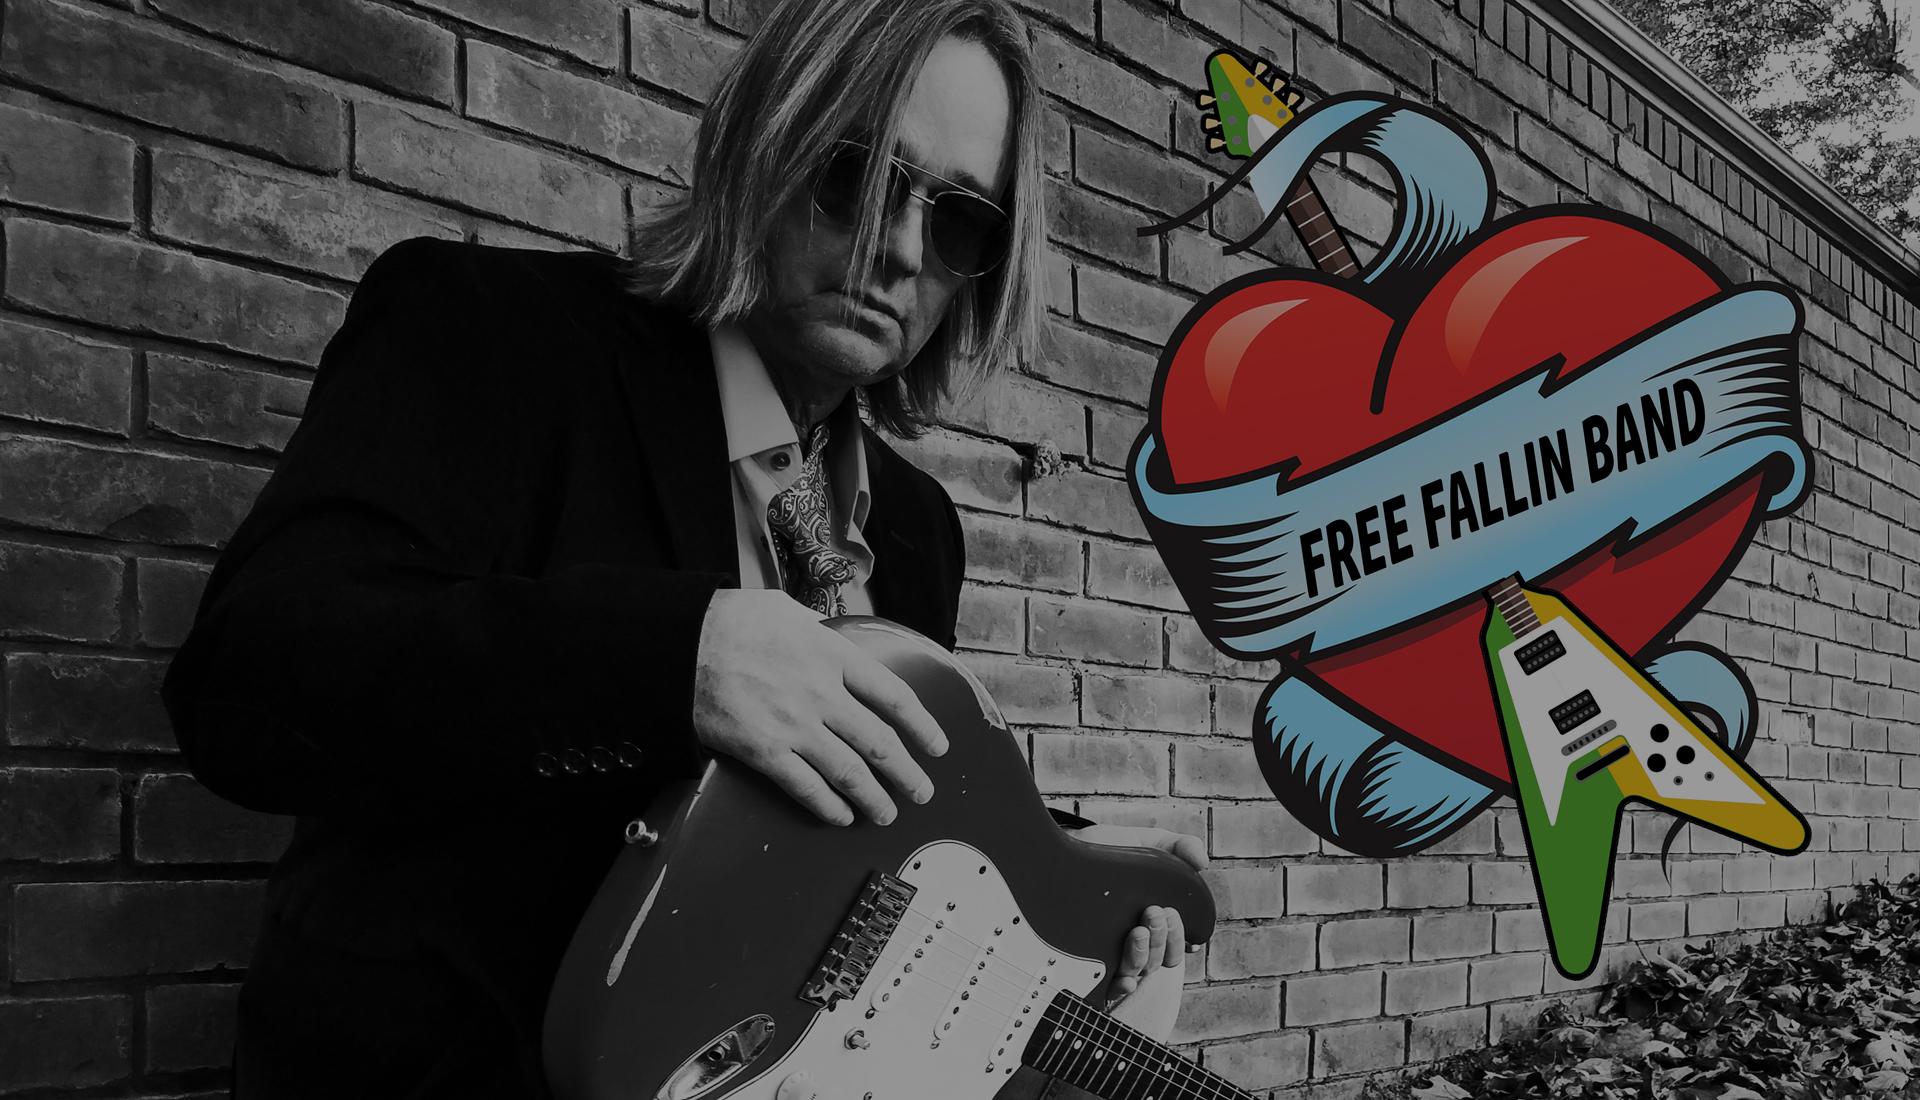 The Free Fallin' Band